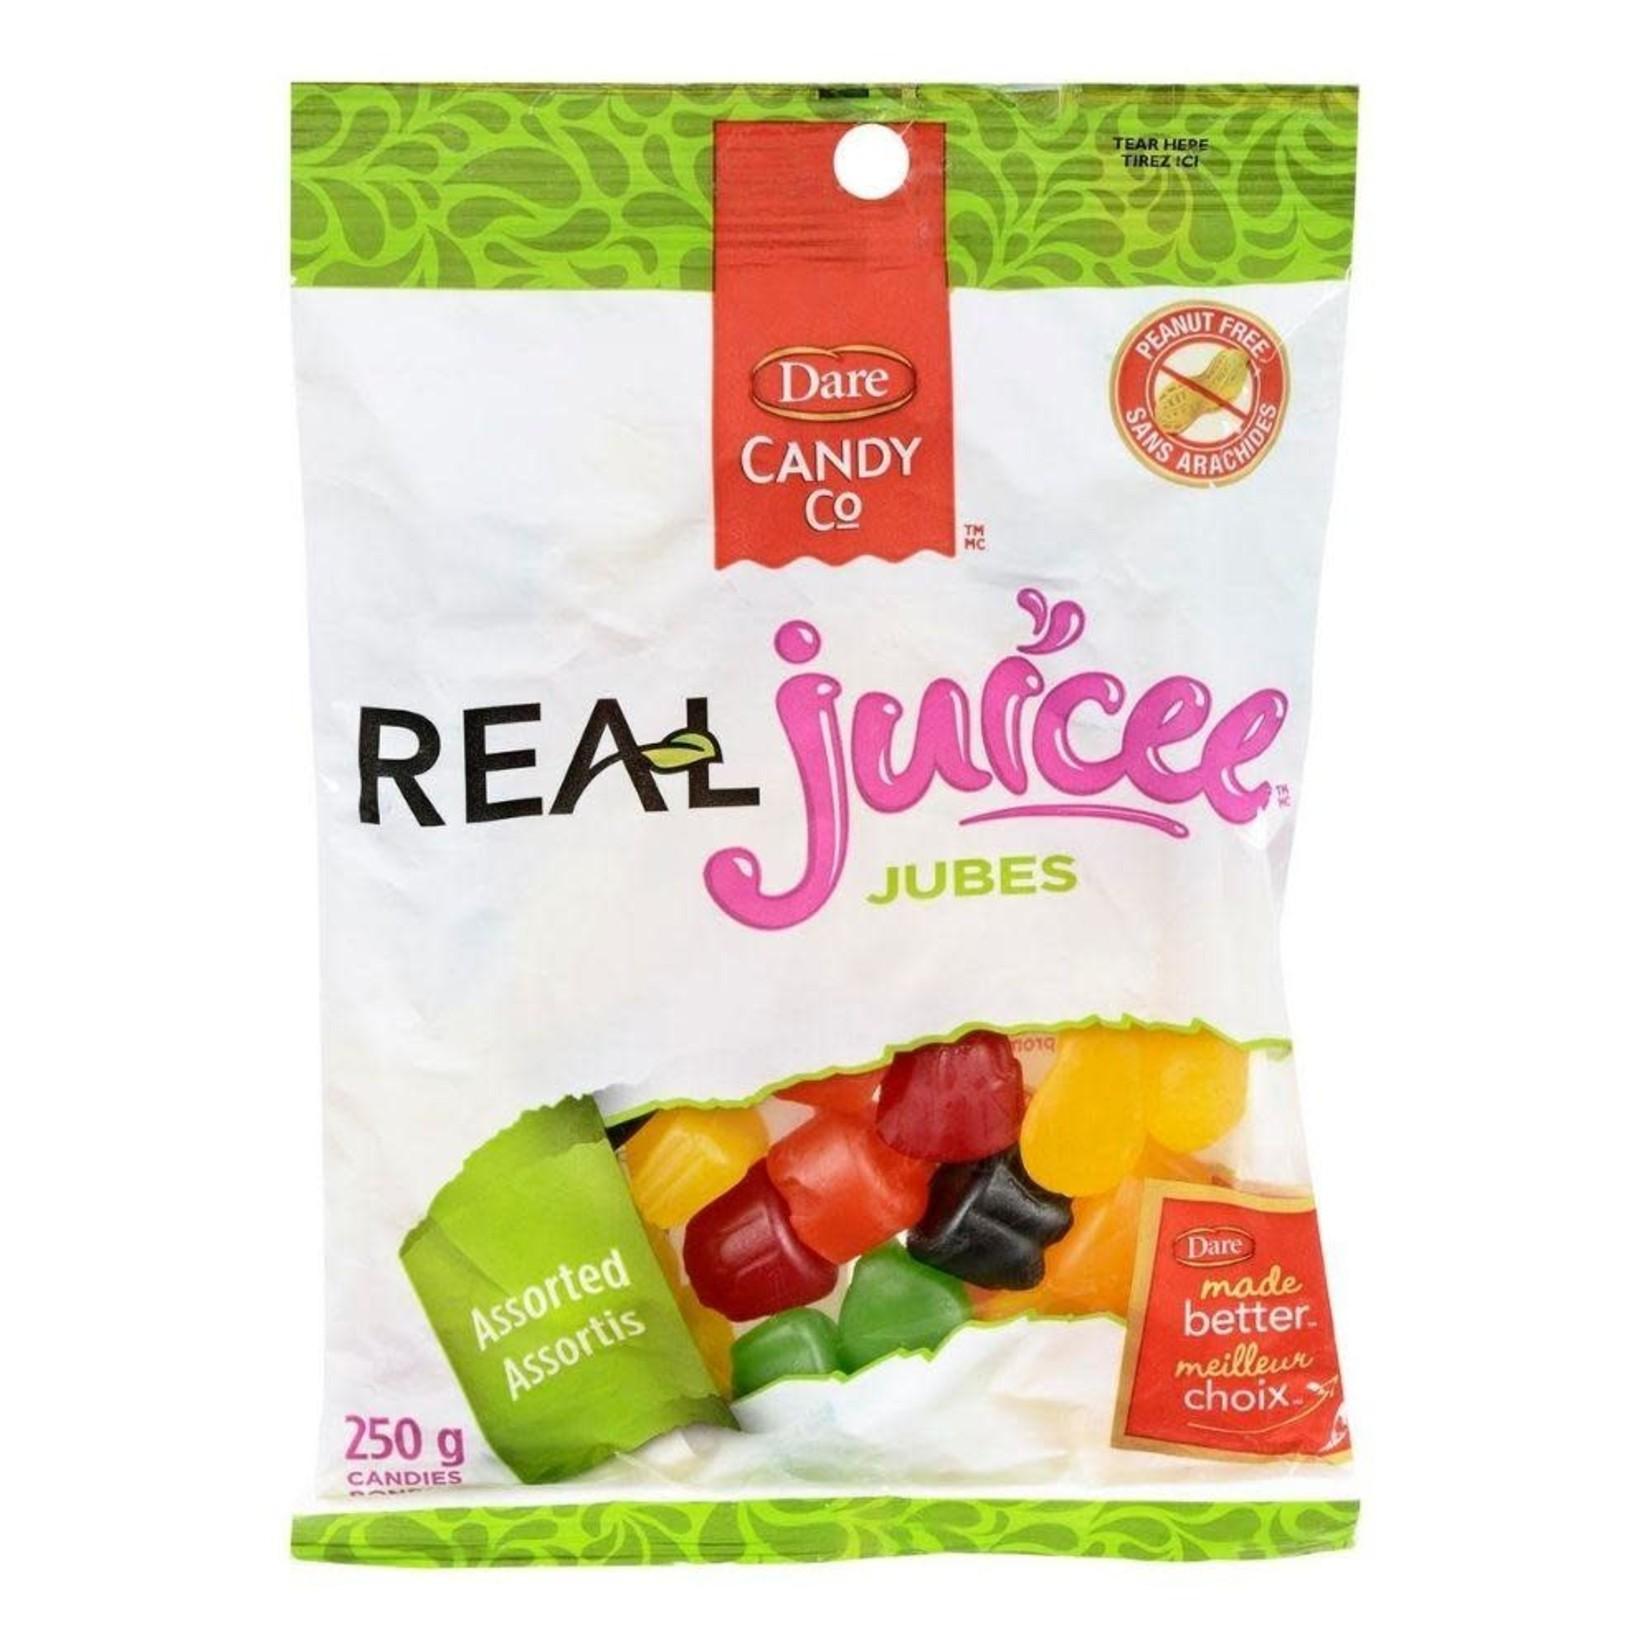 Real Juicee Jubes 250g